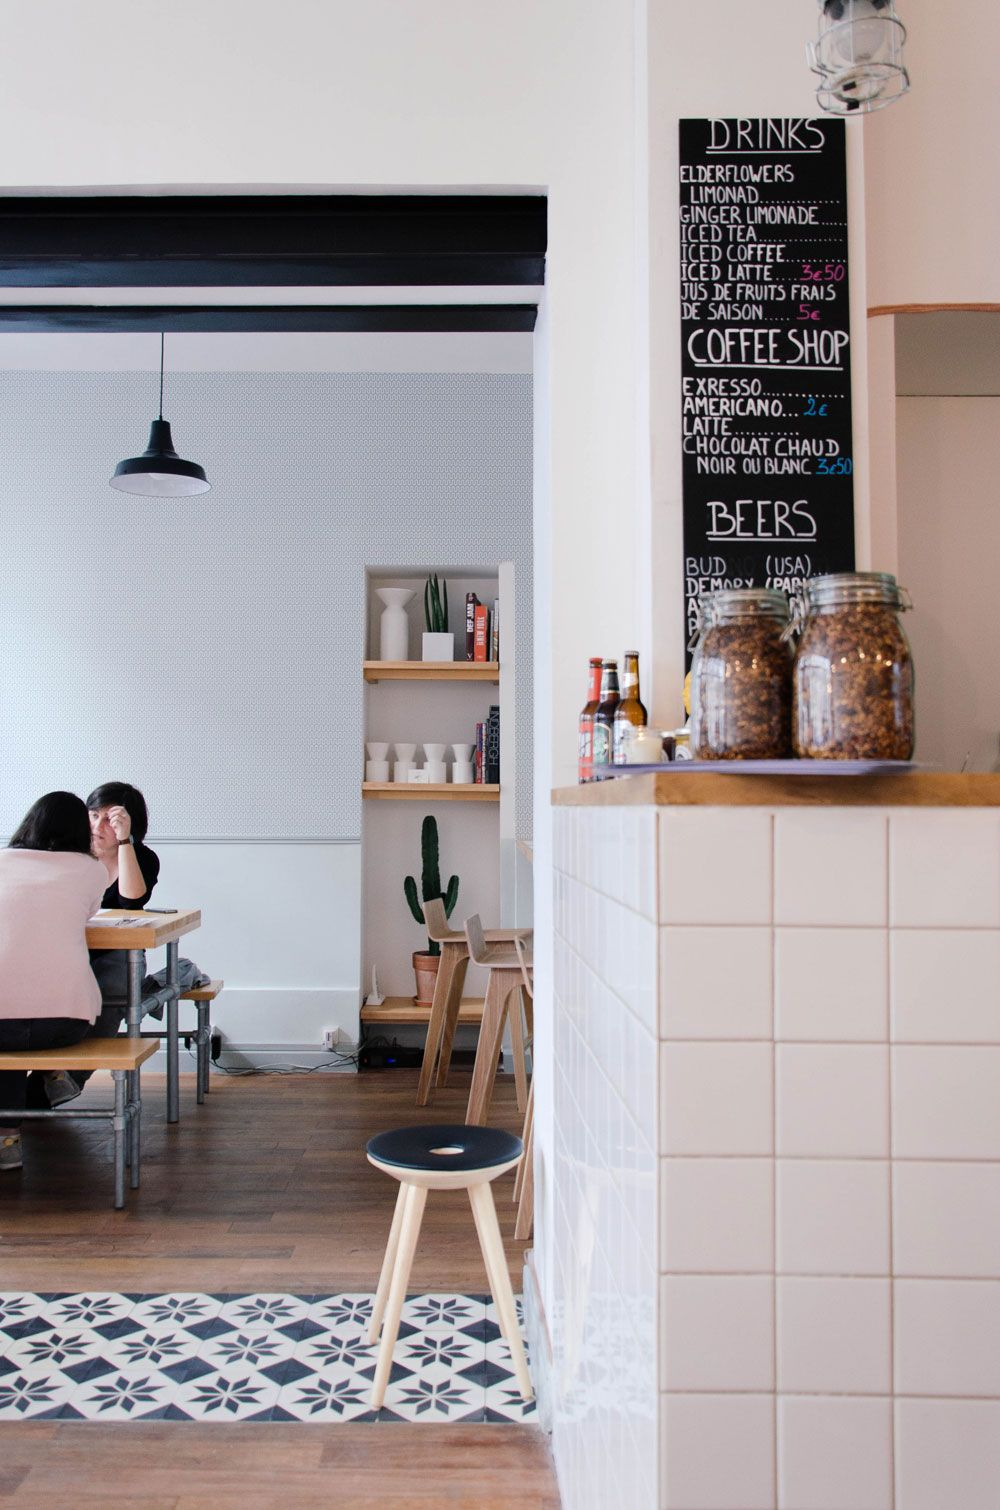 Paperboy Le Blog D Olive Cafe Interior Restaurant Interior Shop Interiors